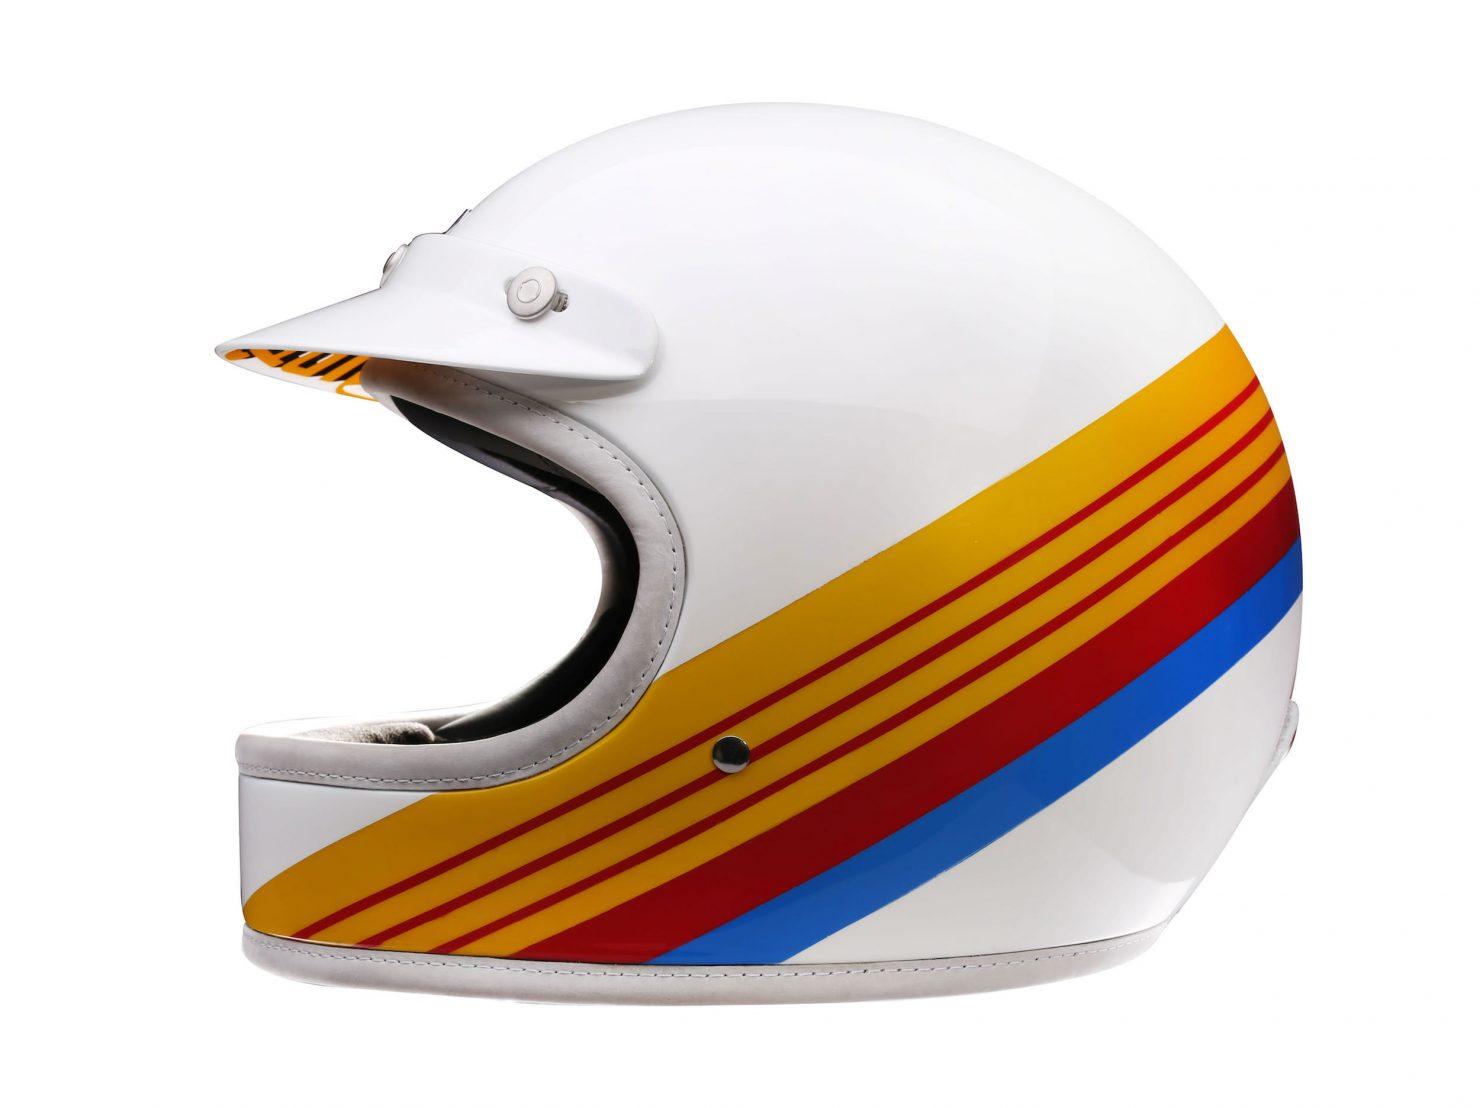 HEDON X DIRTQUAKE SIDE 1480x1108 - Hedon Heroine Dirt Quake Trailblazer Helmet